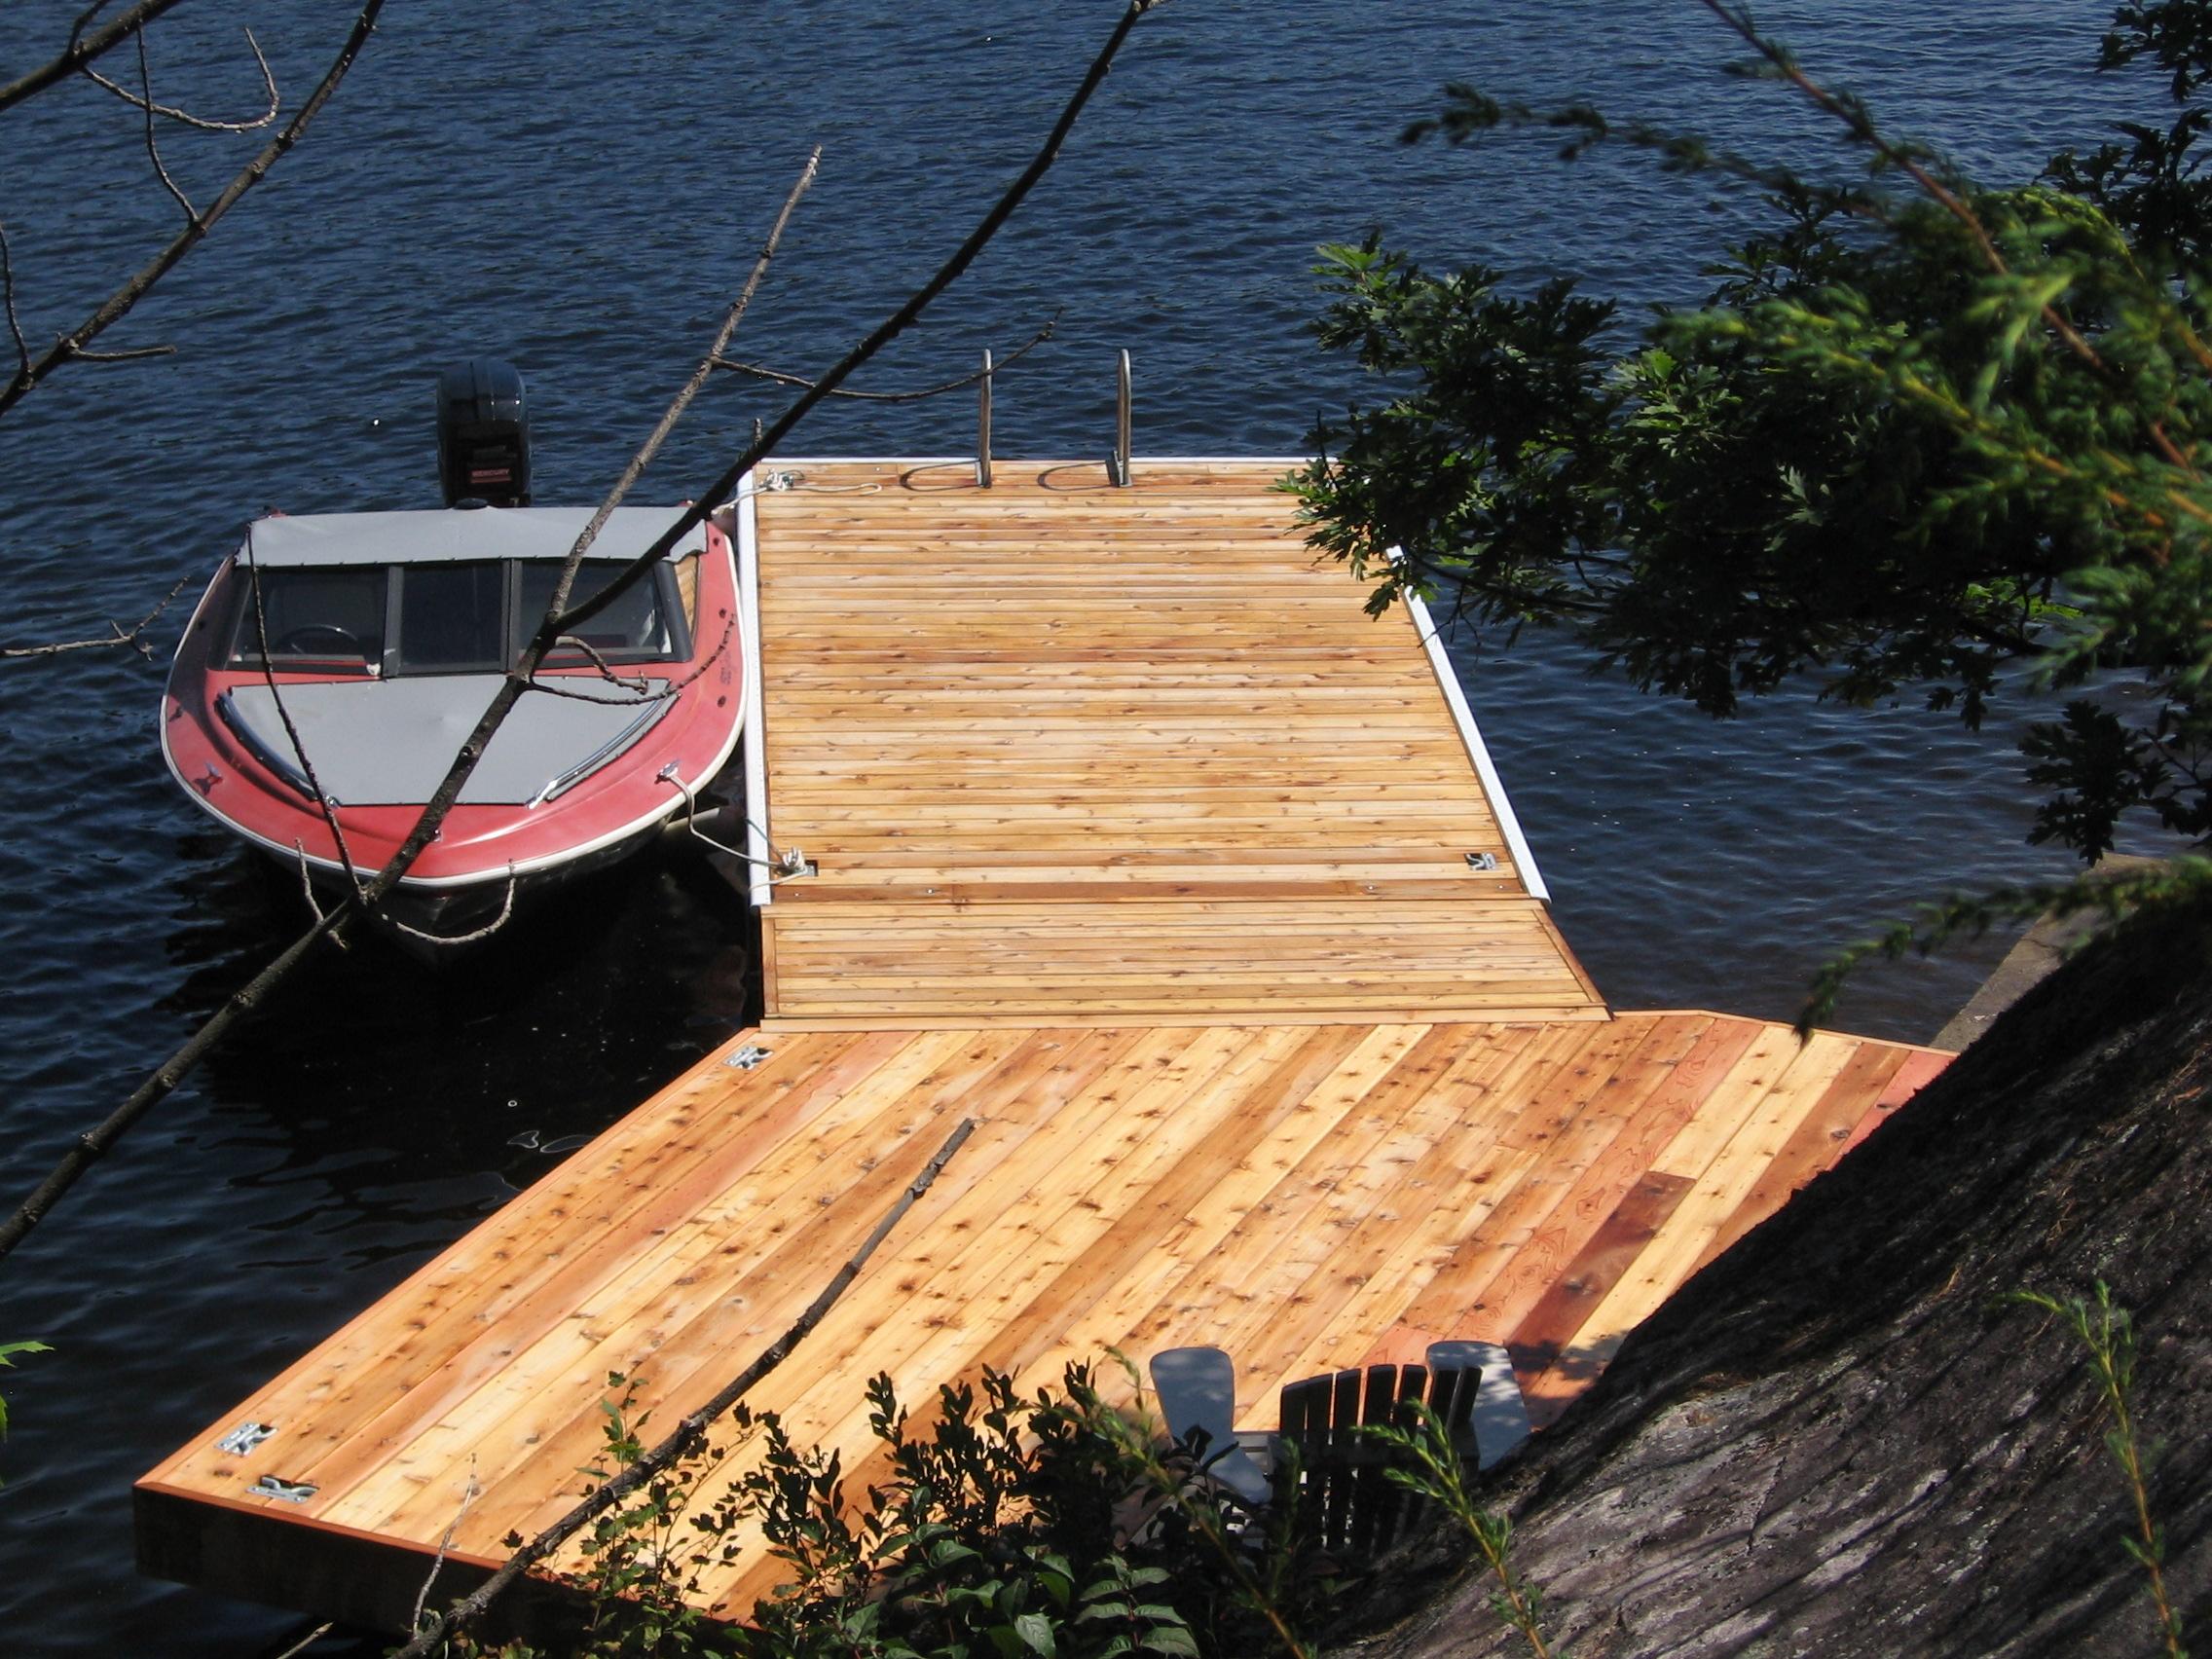 Muskoka Docks - Innovative Docking Systems, Design